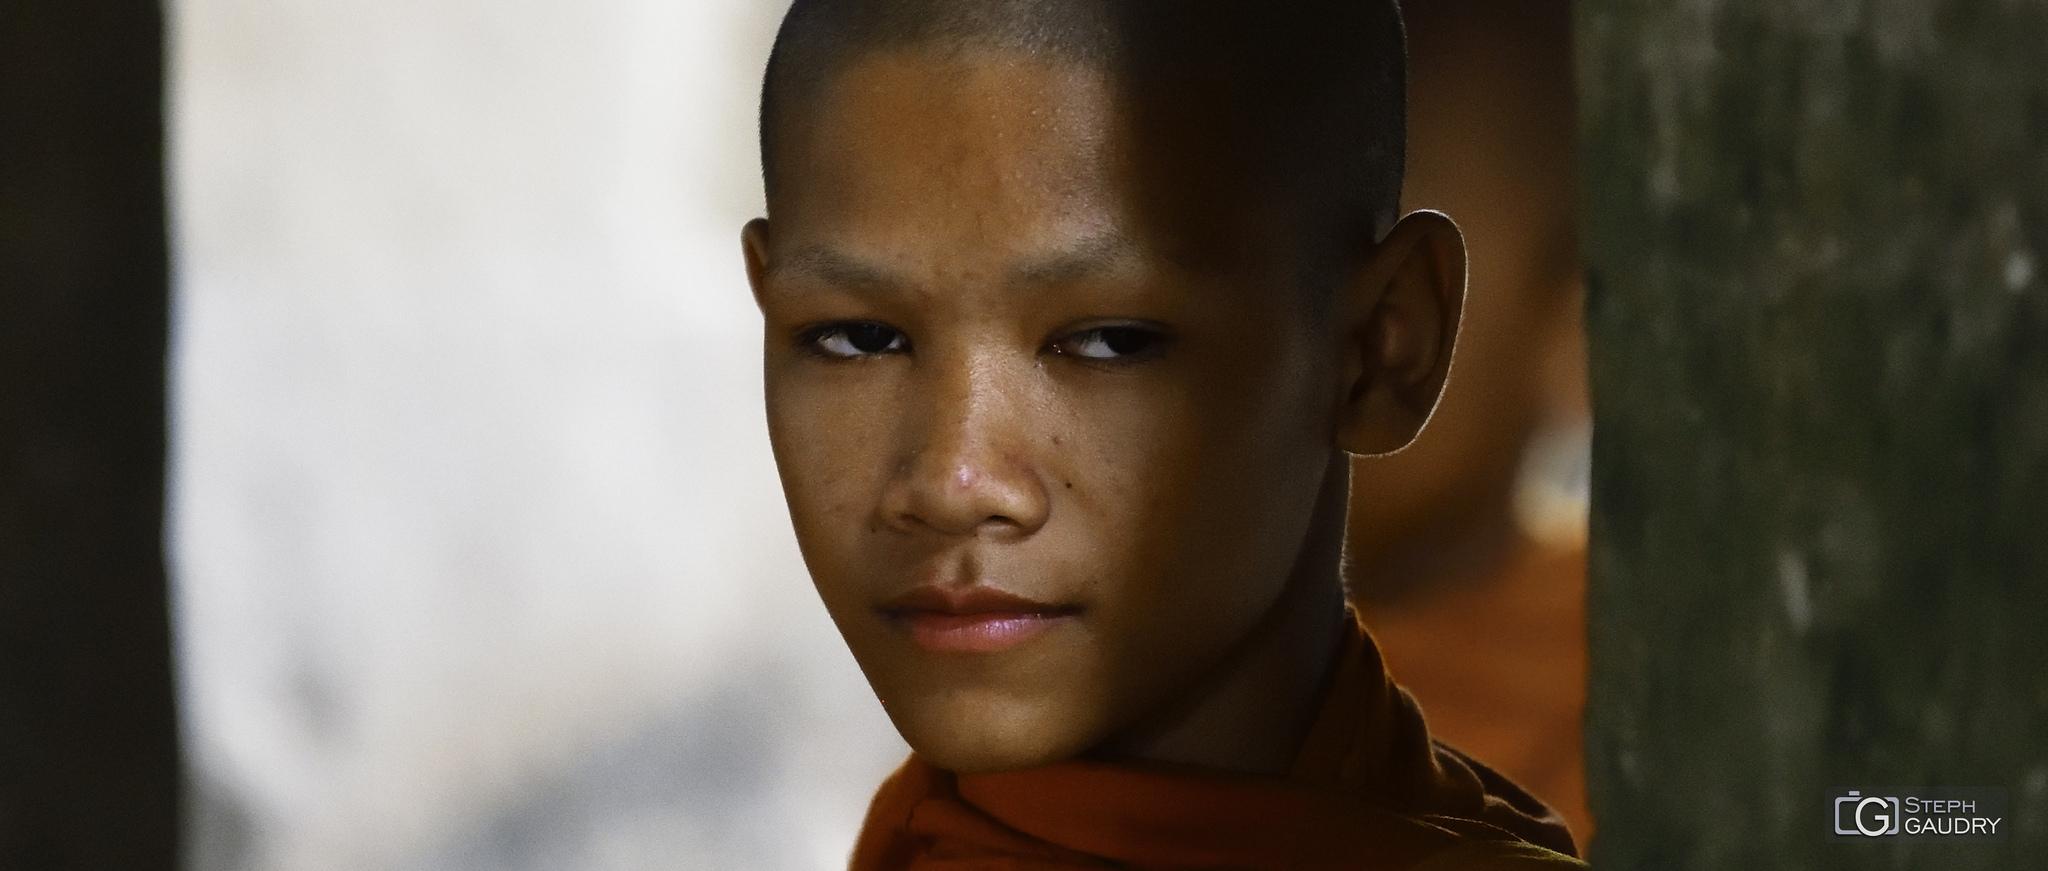 Jeune moine au Cambodge [Click to start slideshow]